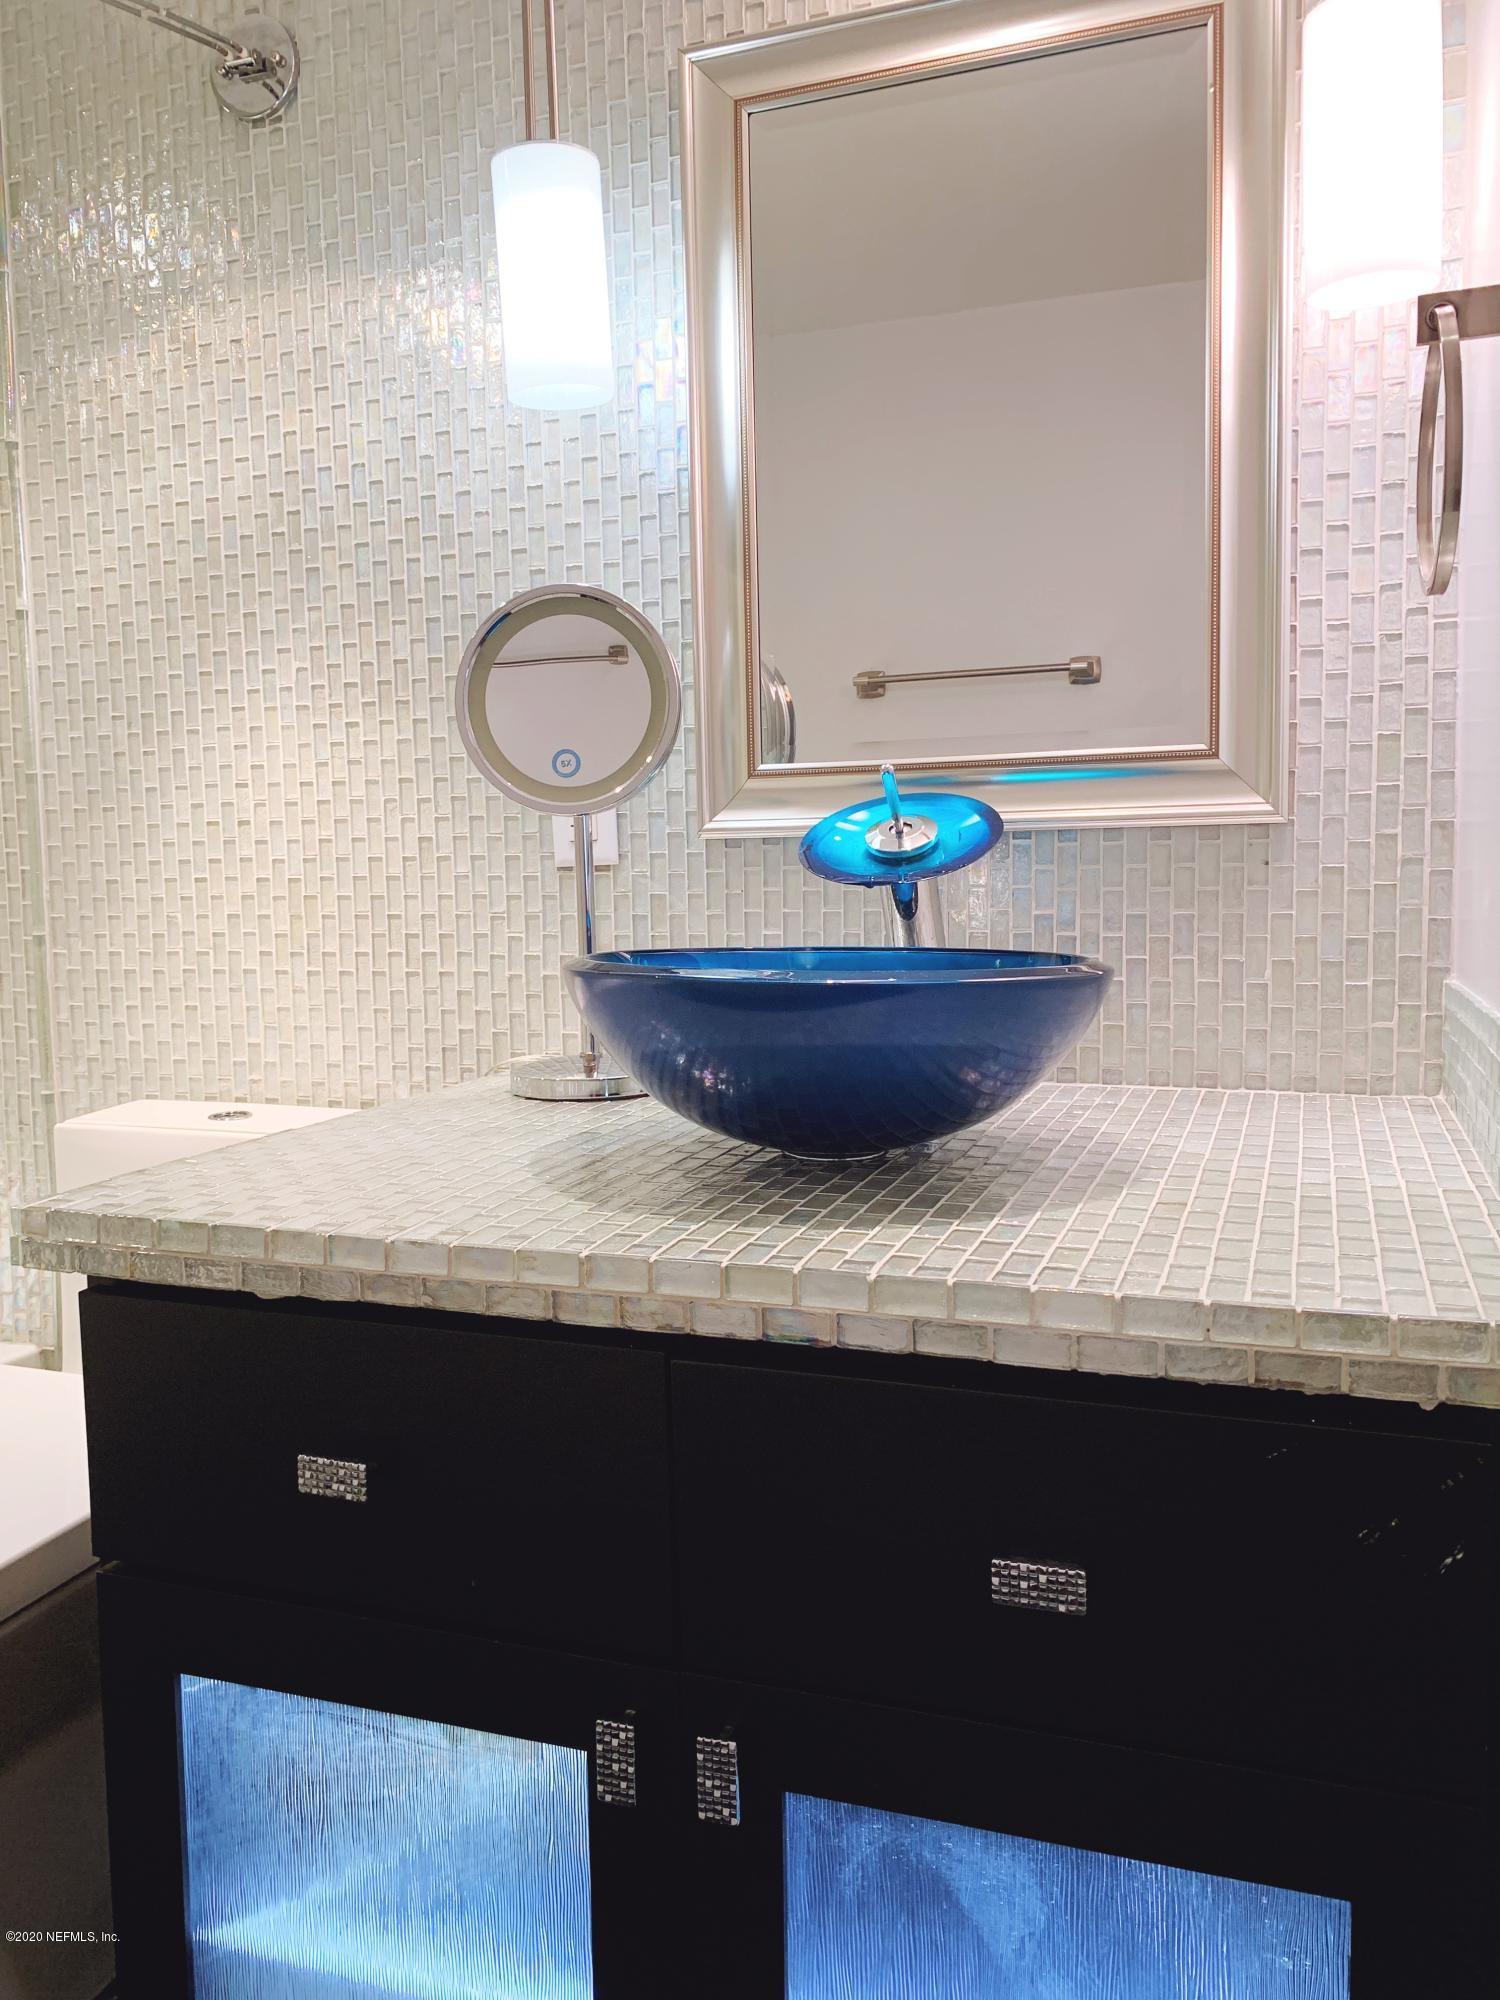 1520 LE BARON, JACKSONVILLE, FLORIDA 32207, 2 Bedrooms Bedrooms, ,2 BathroomsBathrooms,Rental,For Rent,LE BARON,1081851